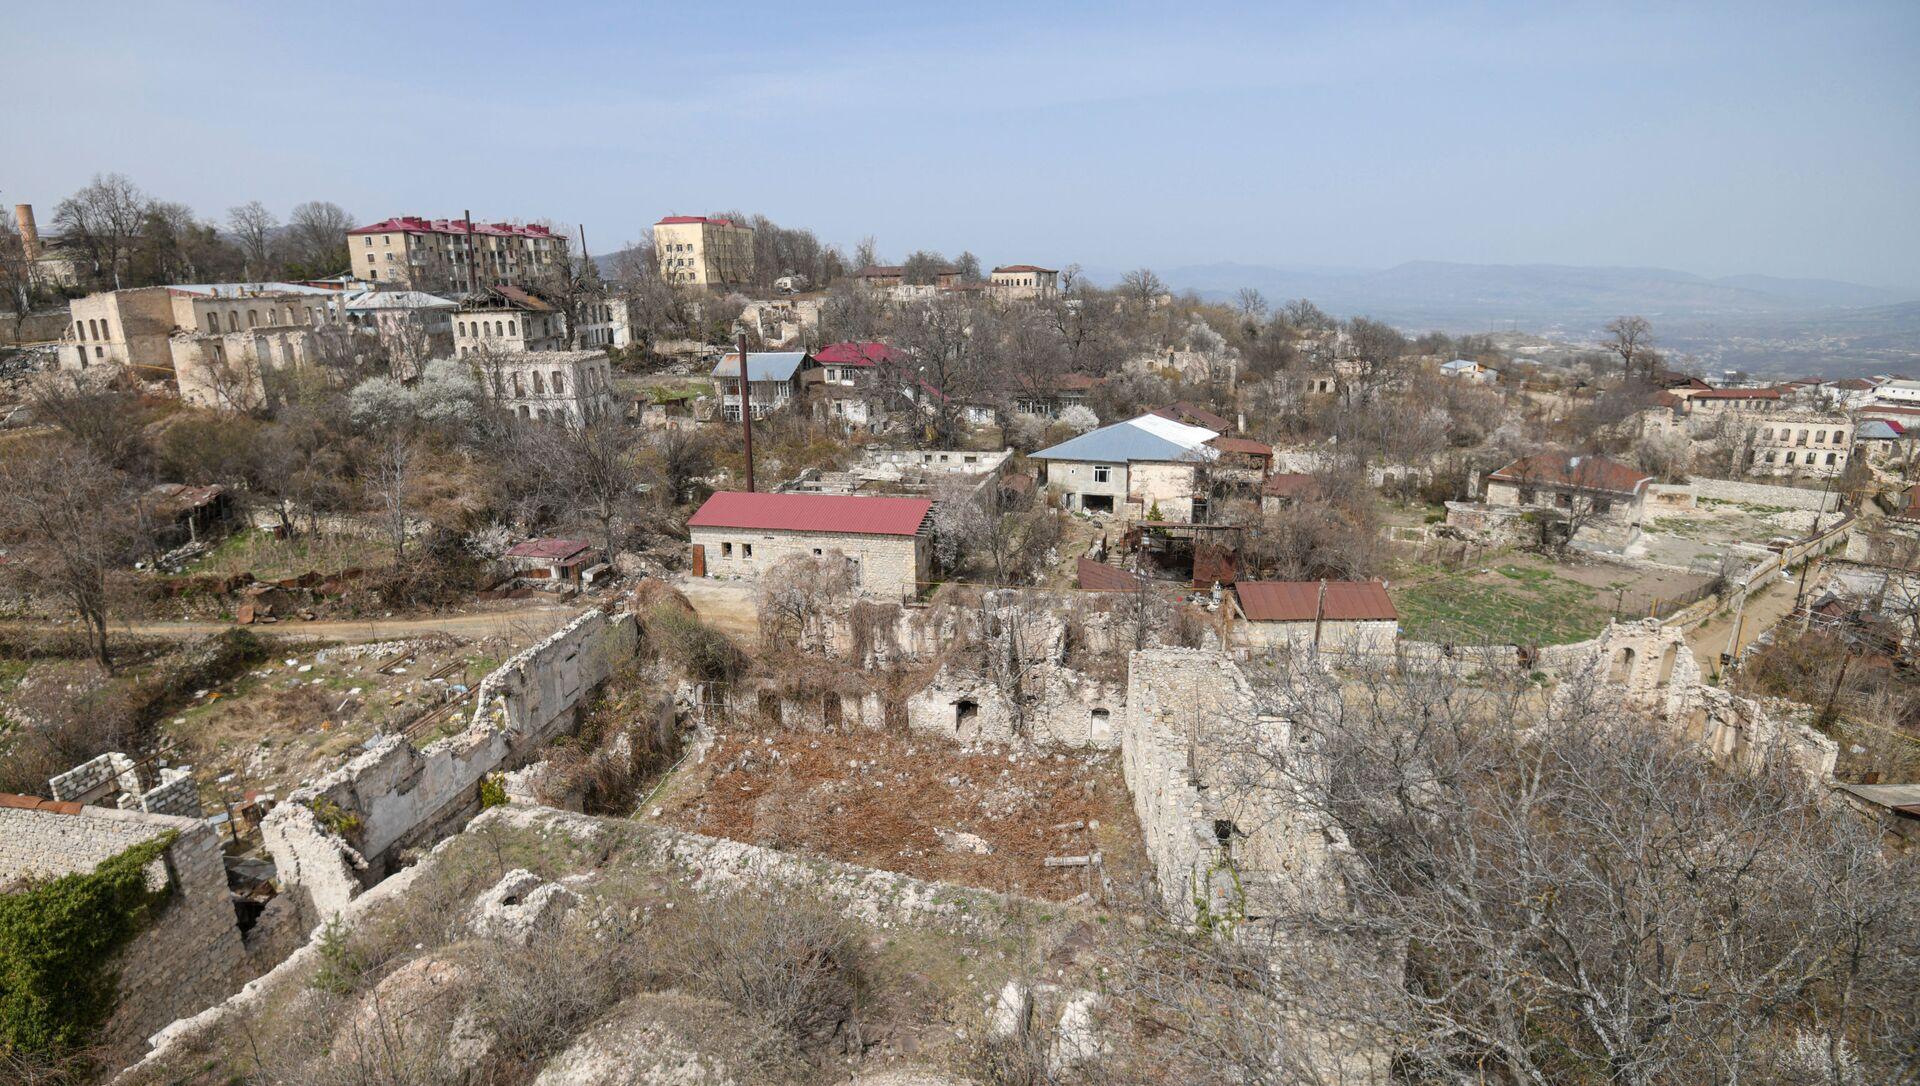 Вид на город Шуша, фото из архива - Sputnik Азербайджан, 1920, 12.09.2021